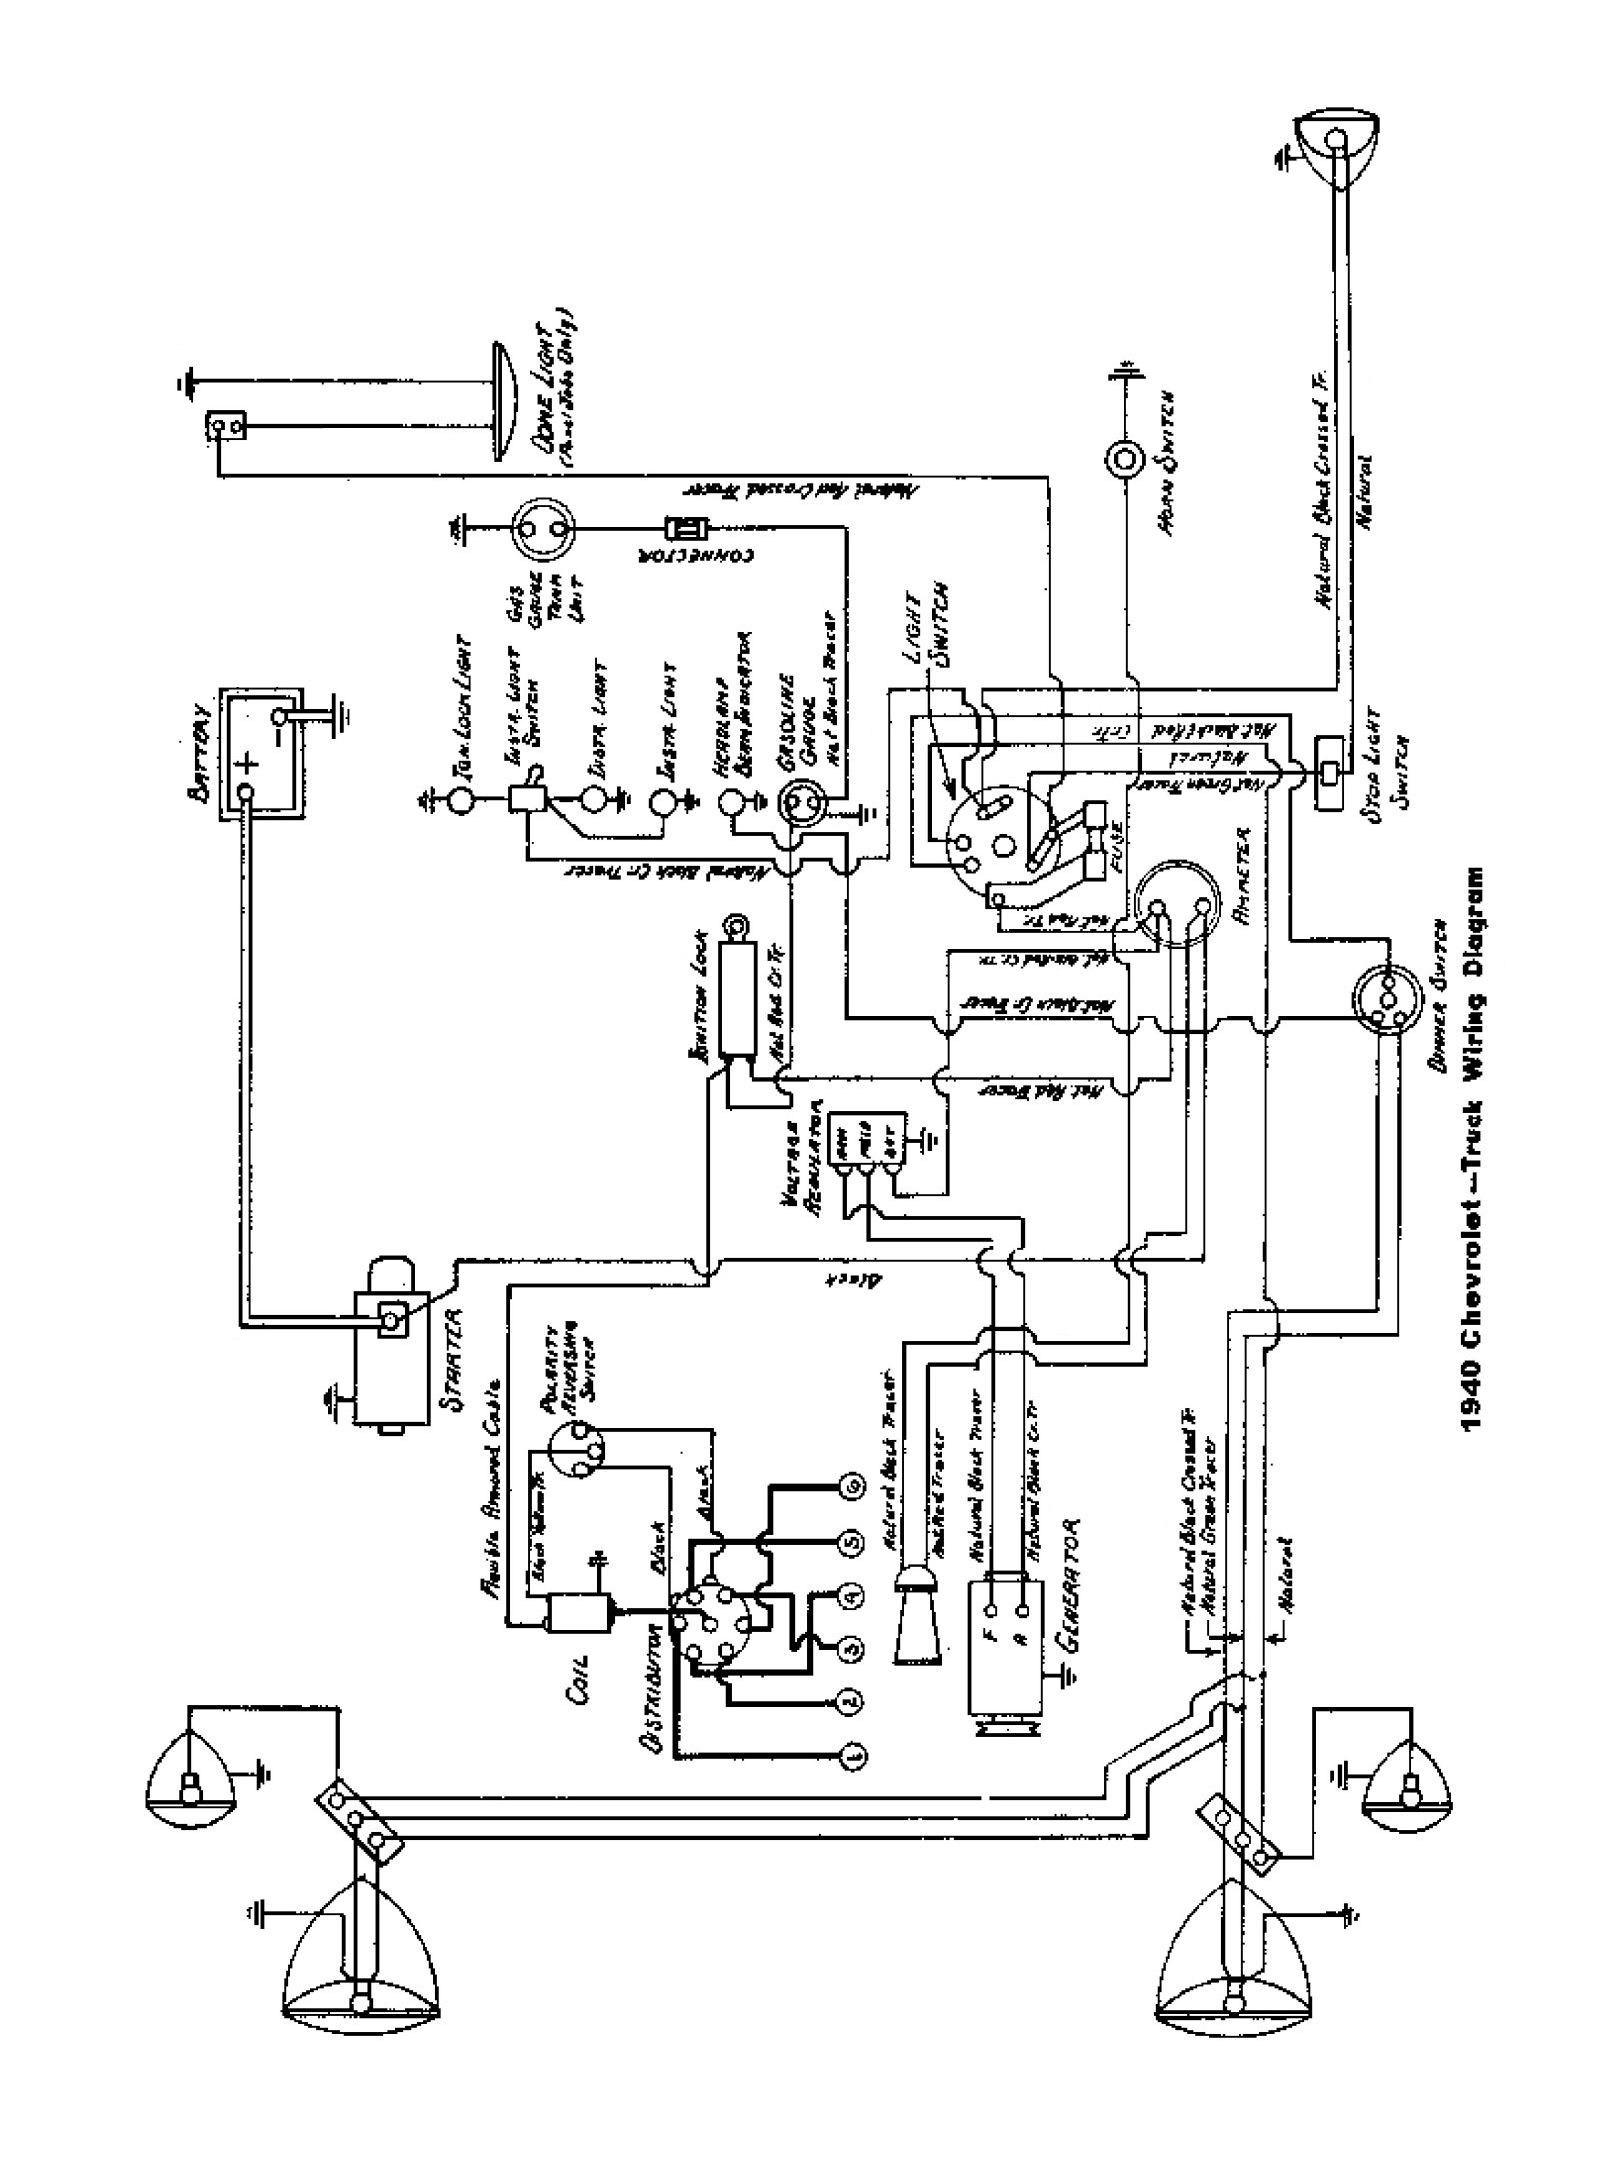 [VD_4436] Quantec Wiring Instructions Wiring Diagram